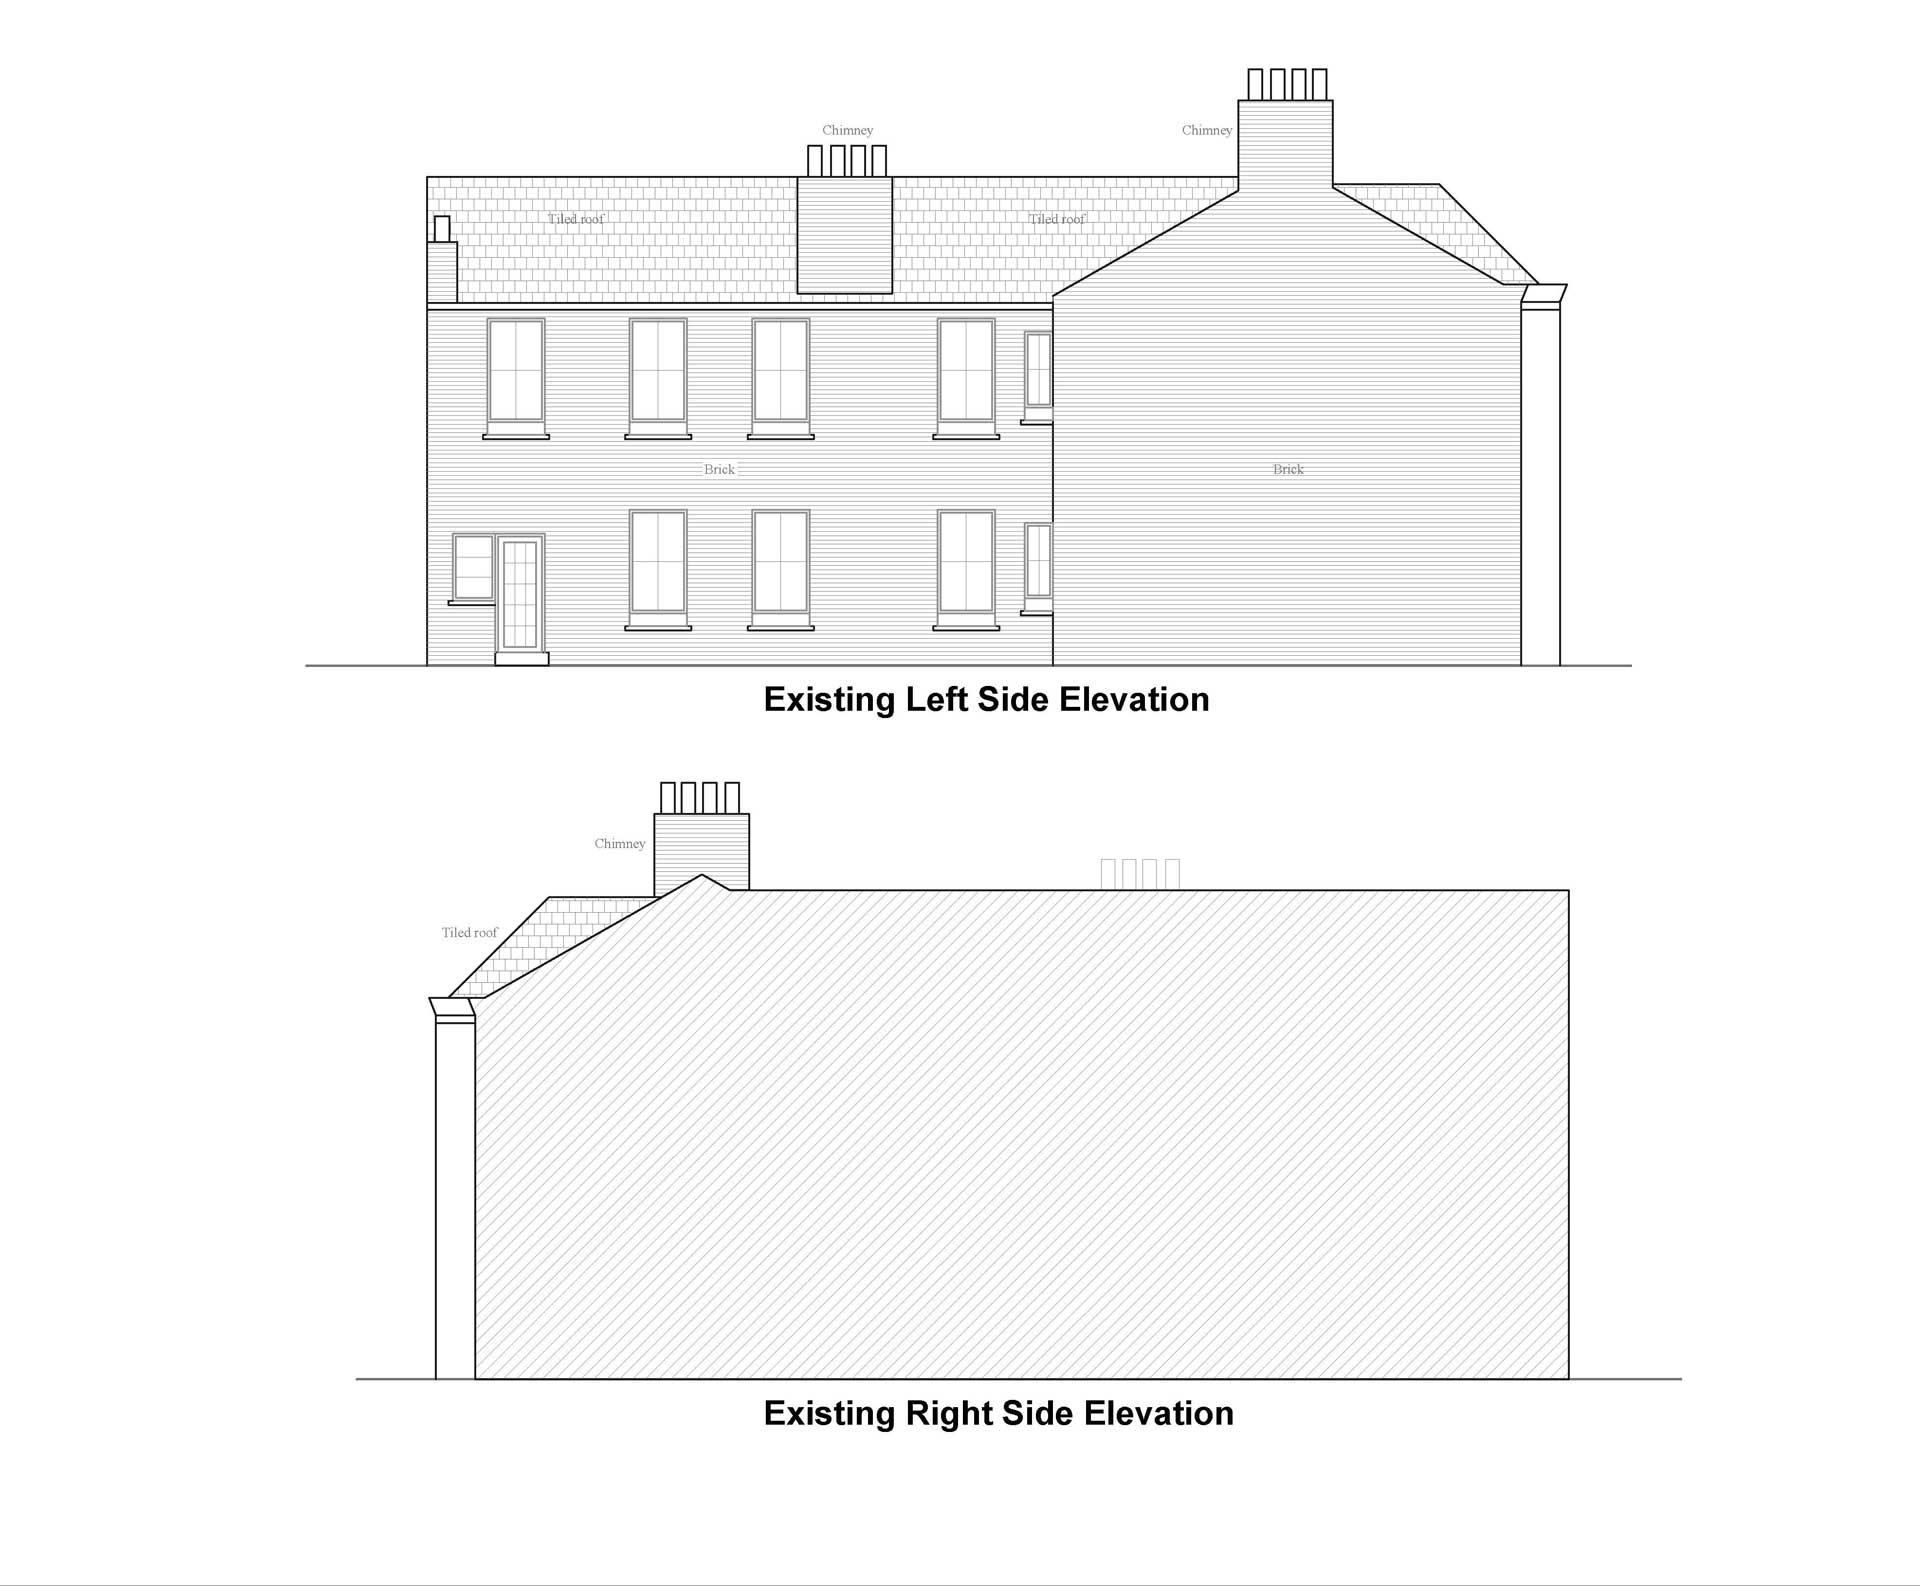 Lambeth-council-Side-Elevation